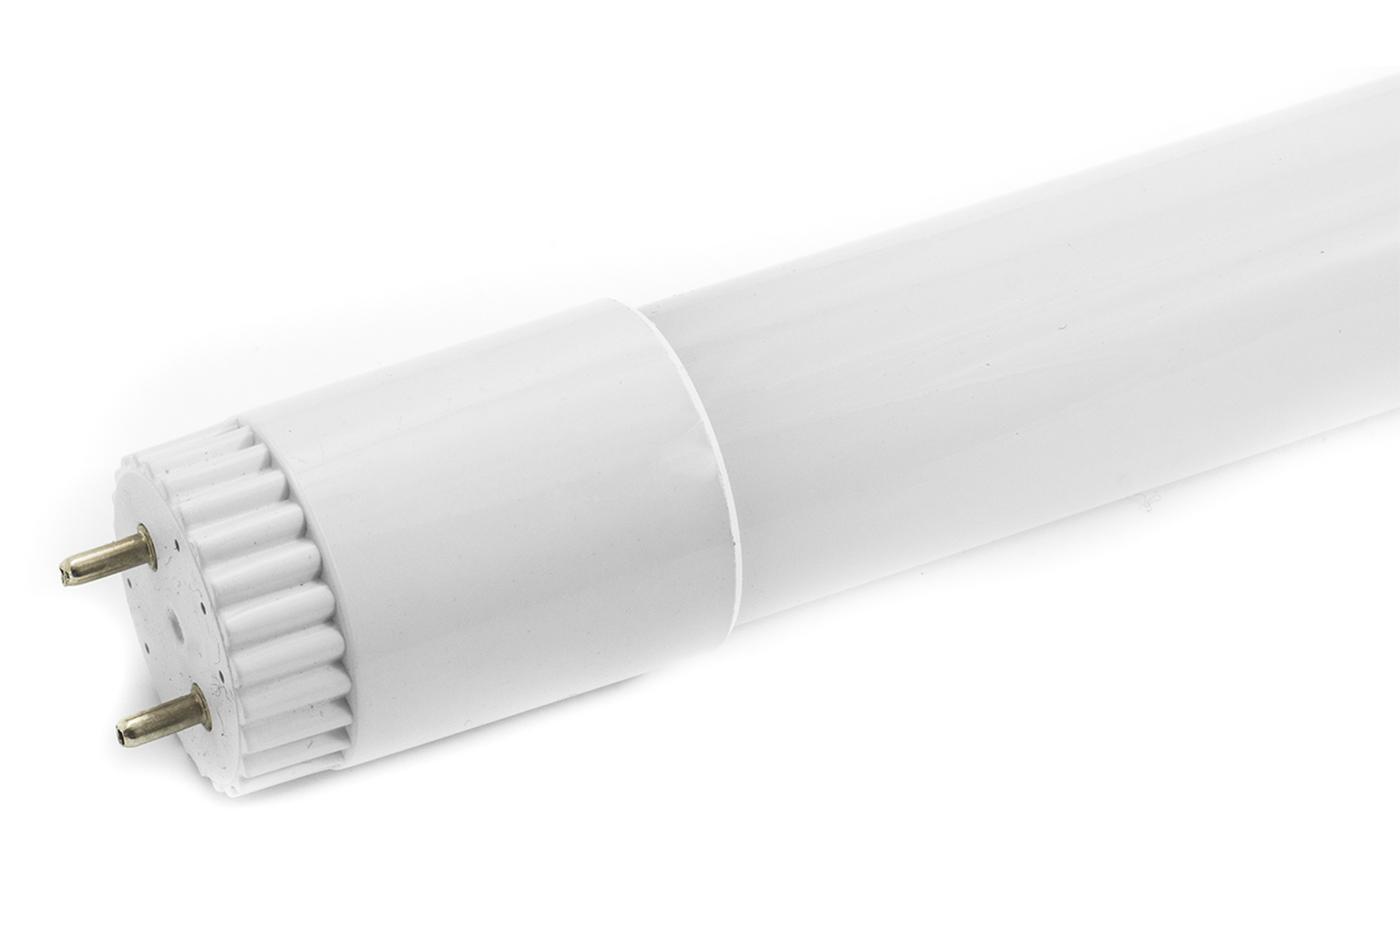 Plafoniere Neon 150 Cm : Bes 22065 tubi led beselettronica neon tubo 24w 150cm luce